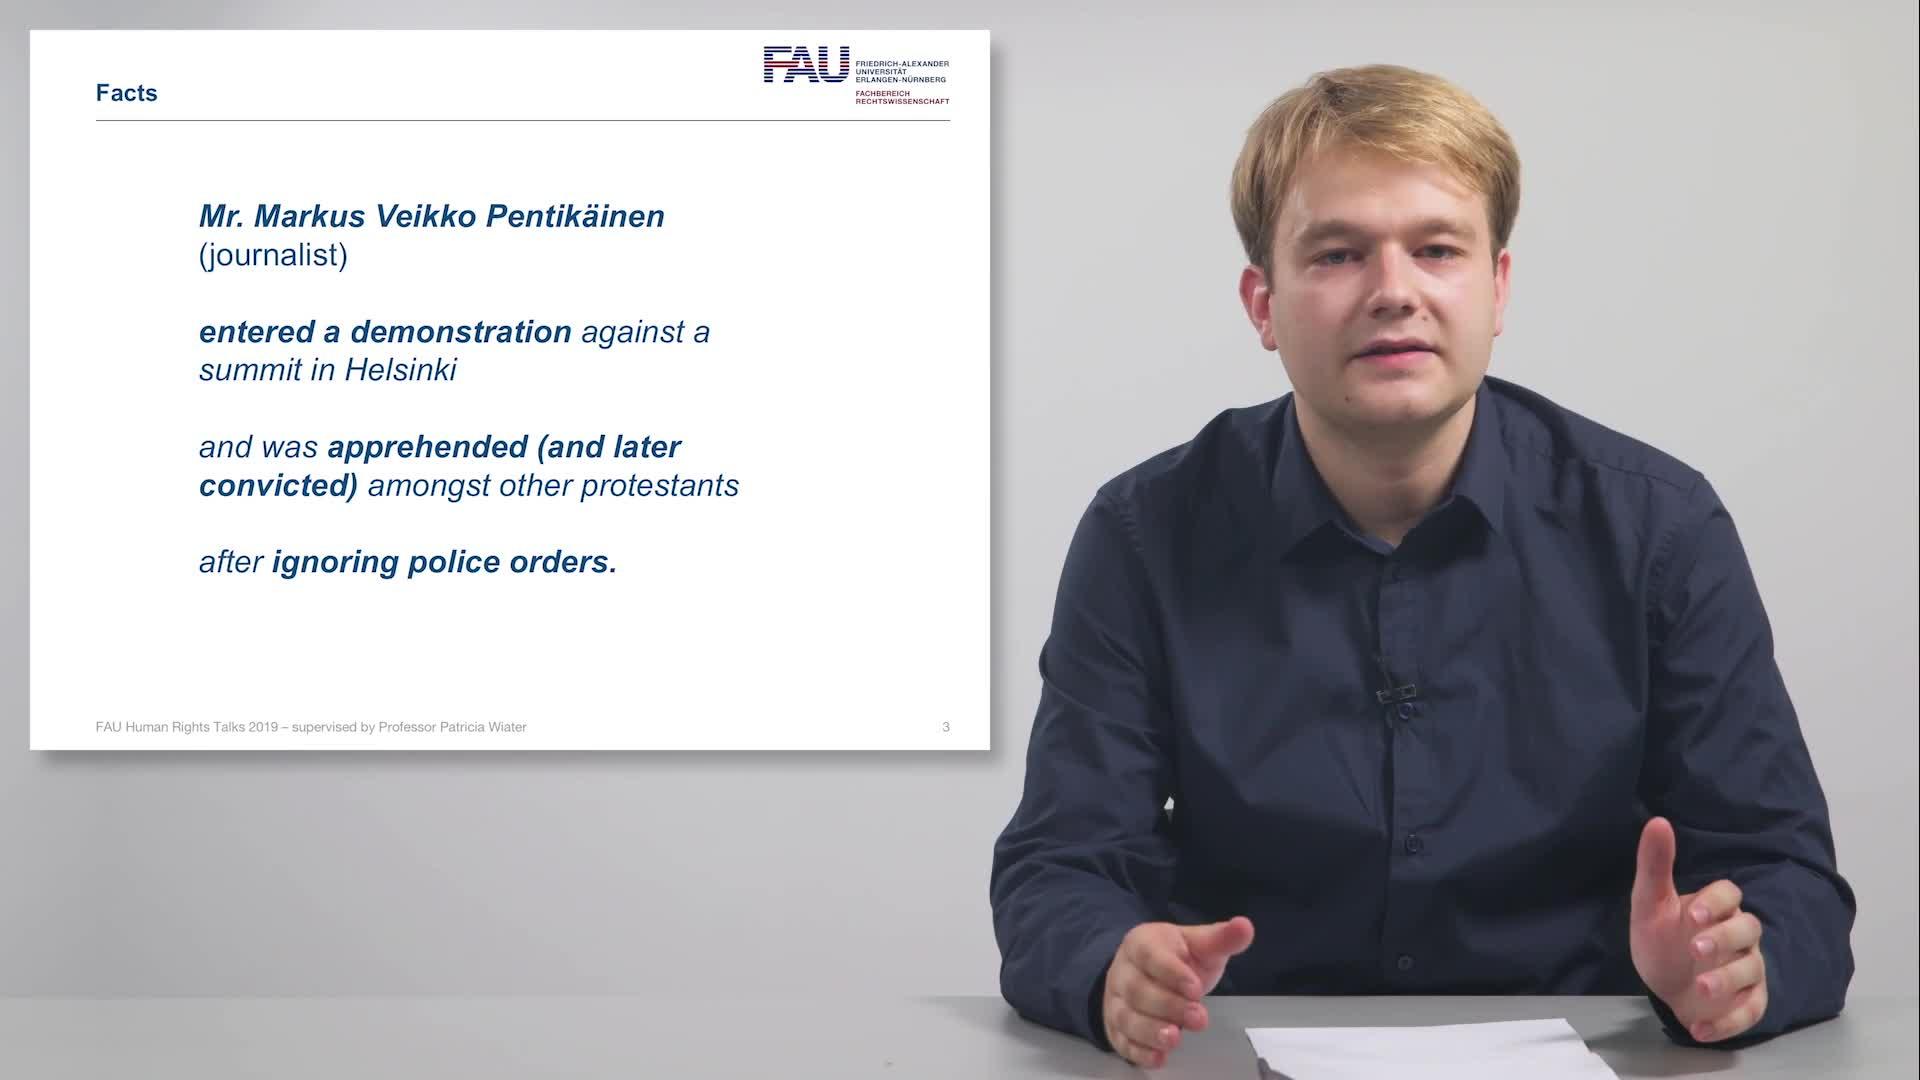 FAU Human Rights Talks – Summer Term 2019: Pentikäinen v. Finland preview image